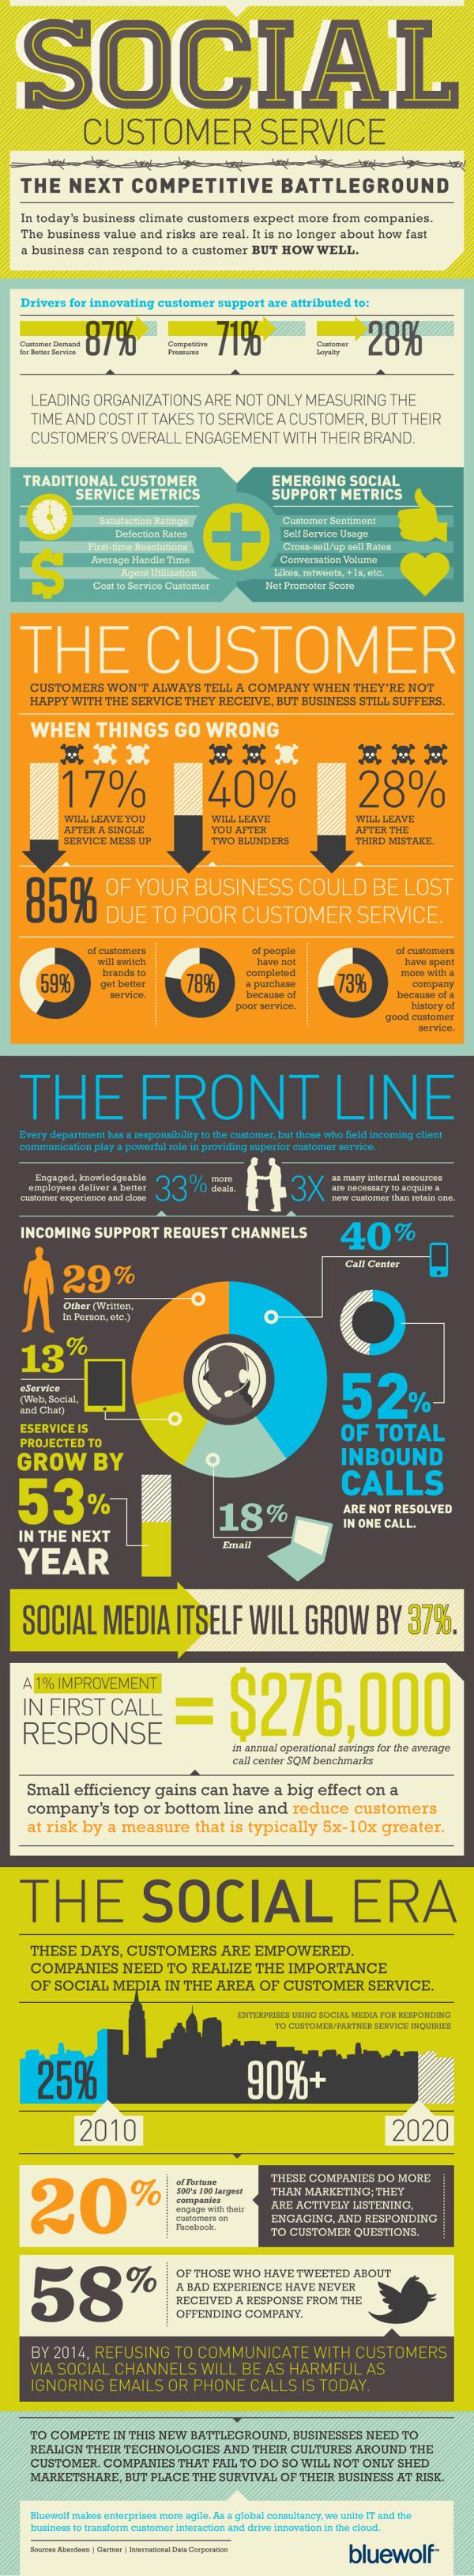 Social Media Customer Service resized 600